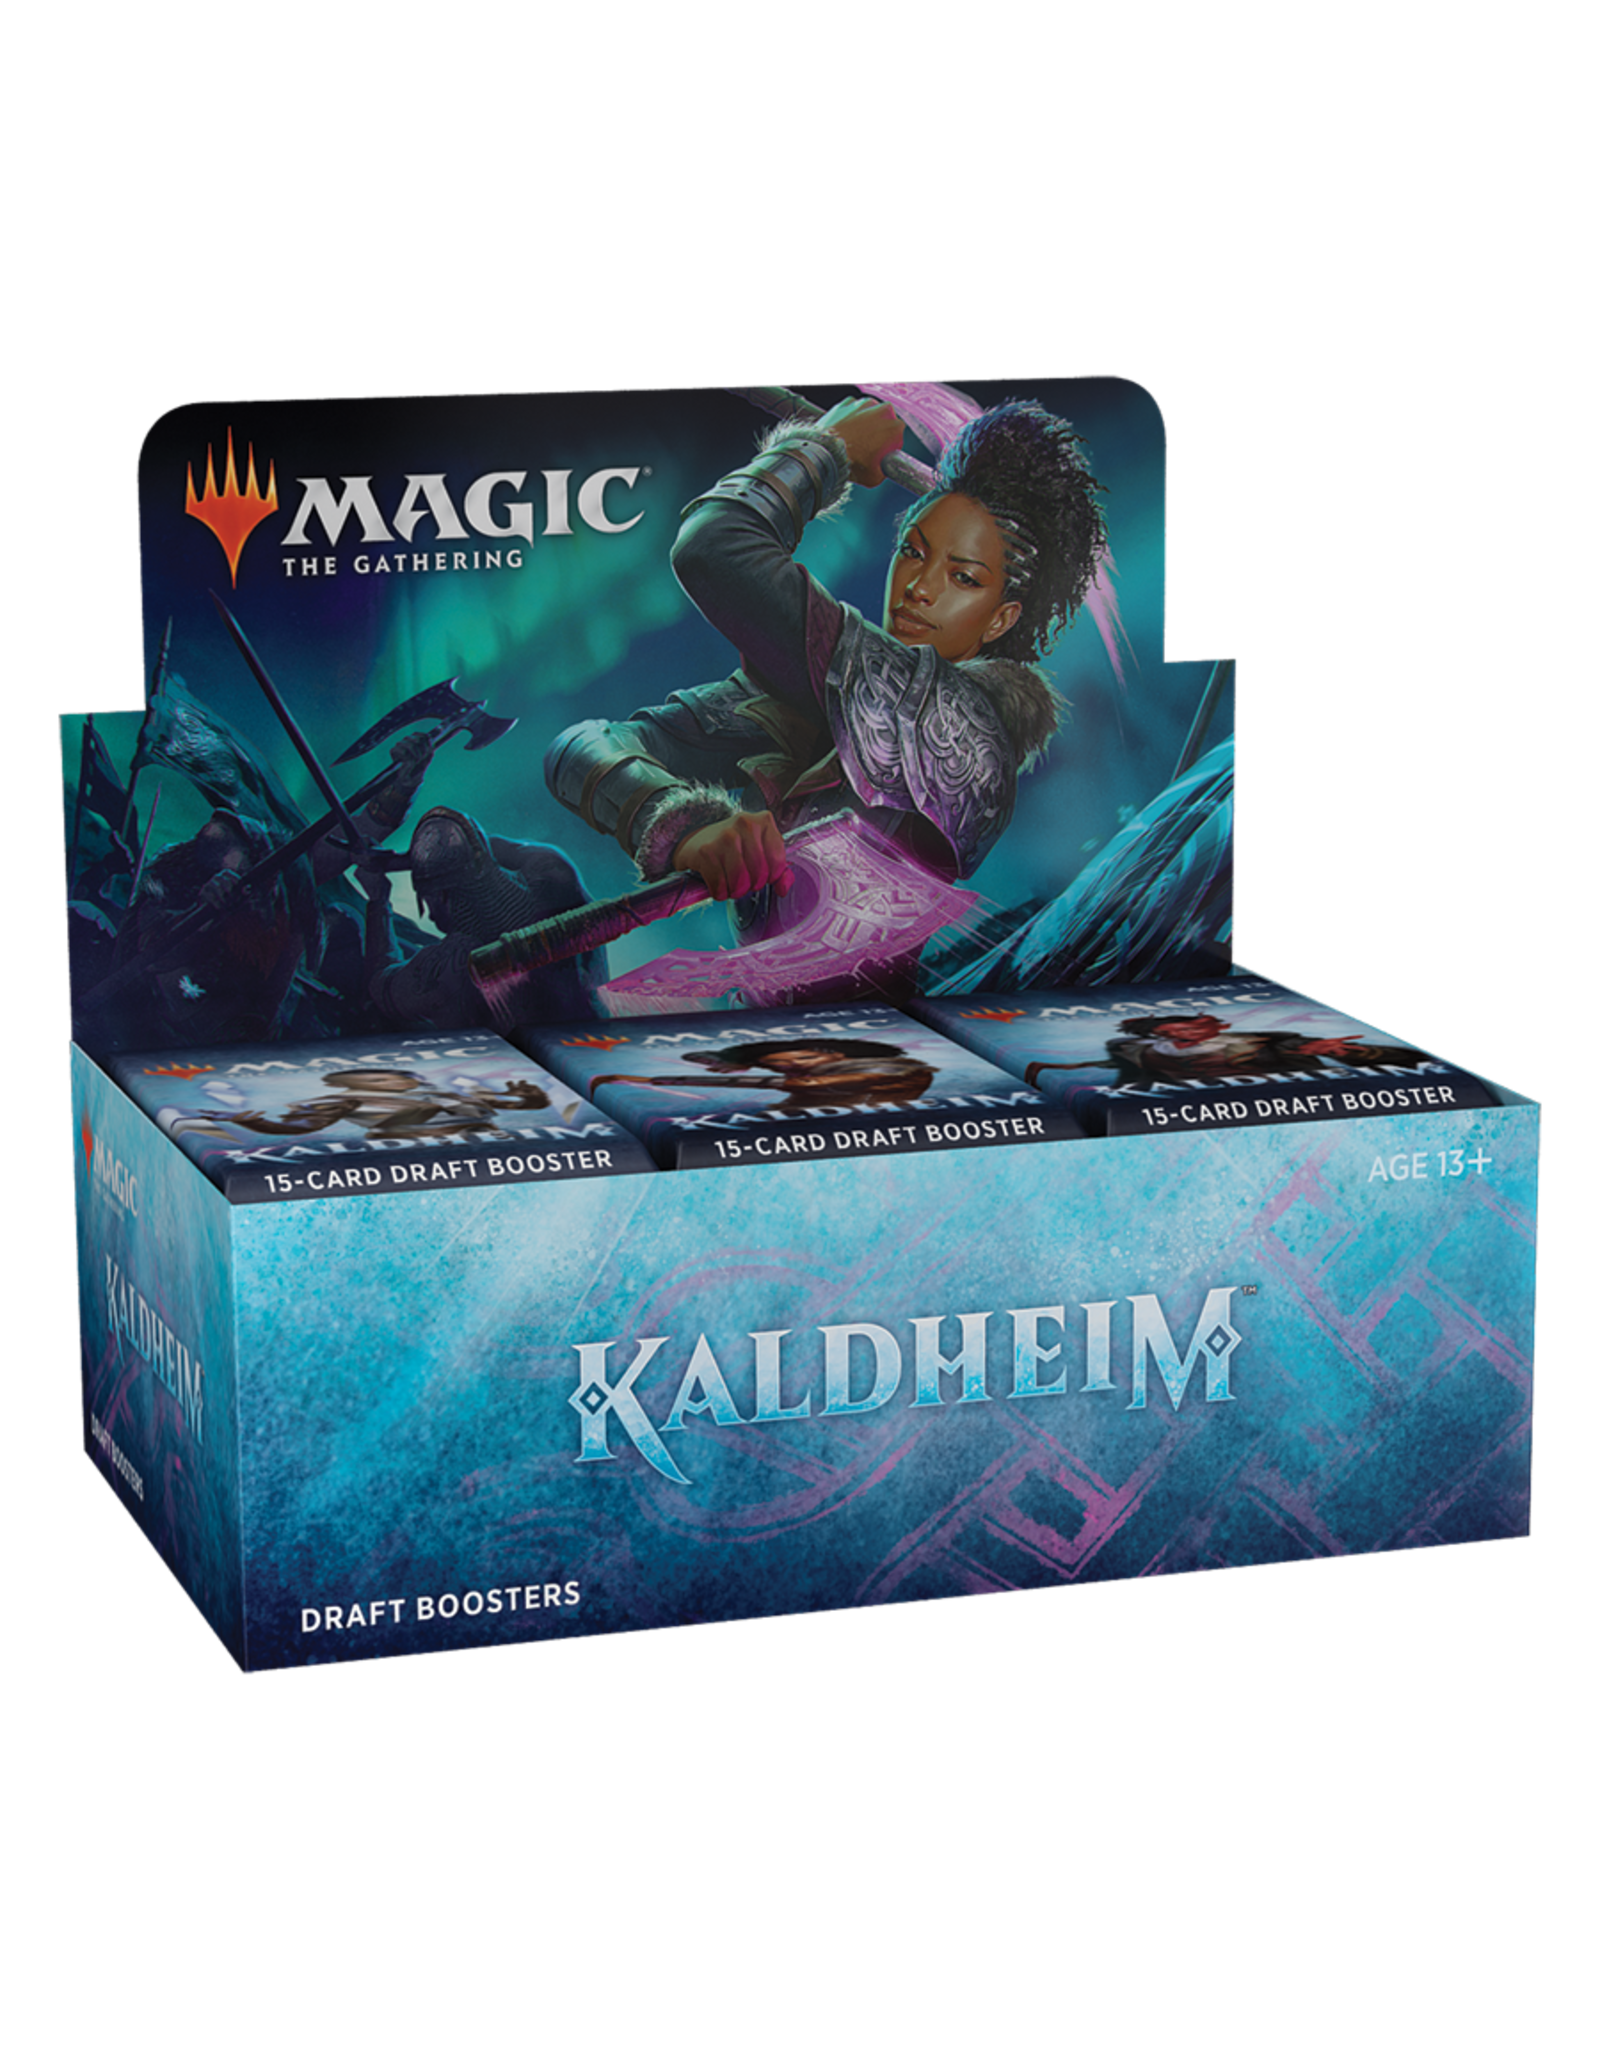 Magic: The Gathering Kaldheim - Draft Booster Box